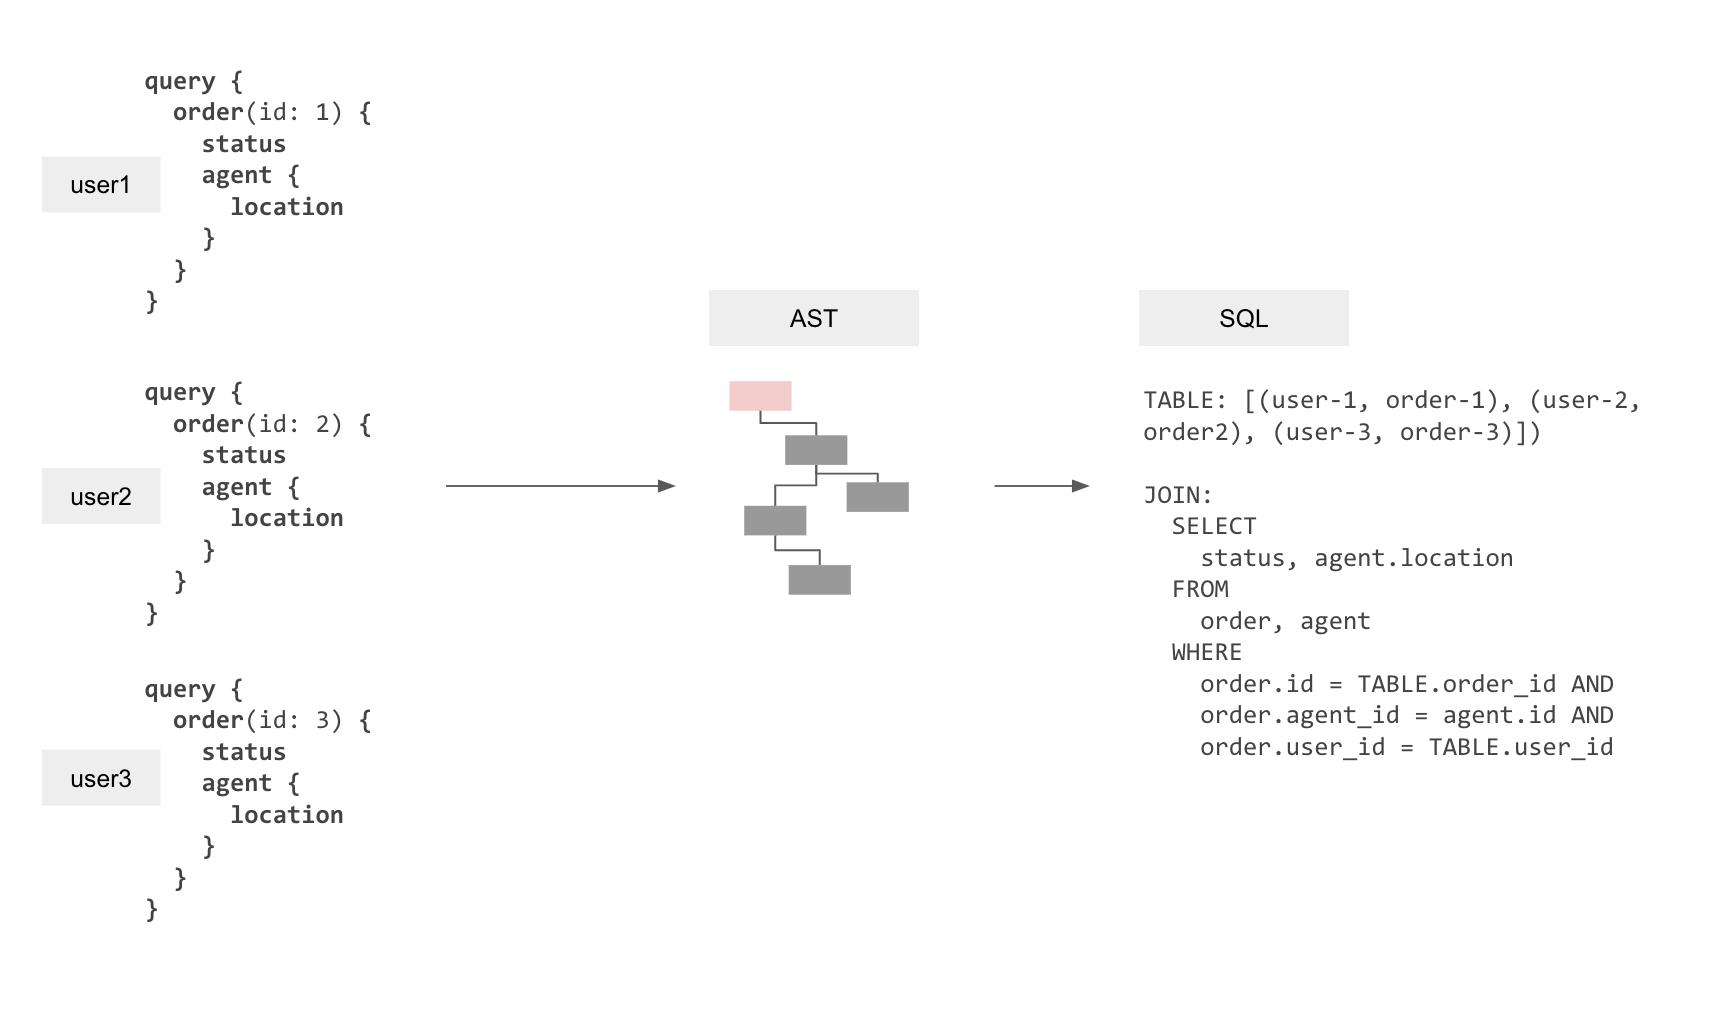 graphql-to-sql-multiplexed